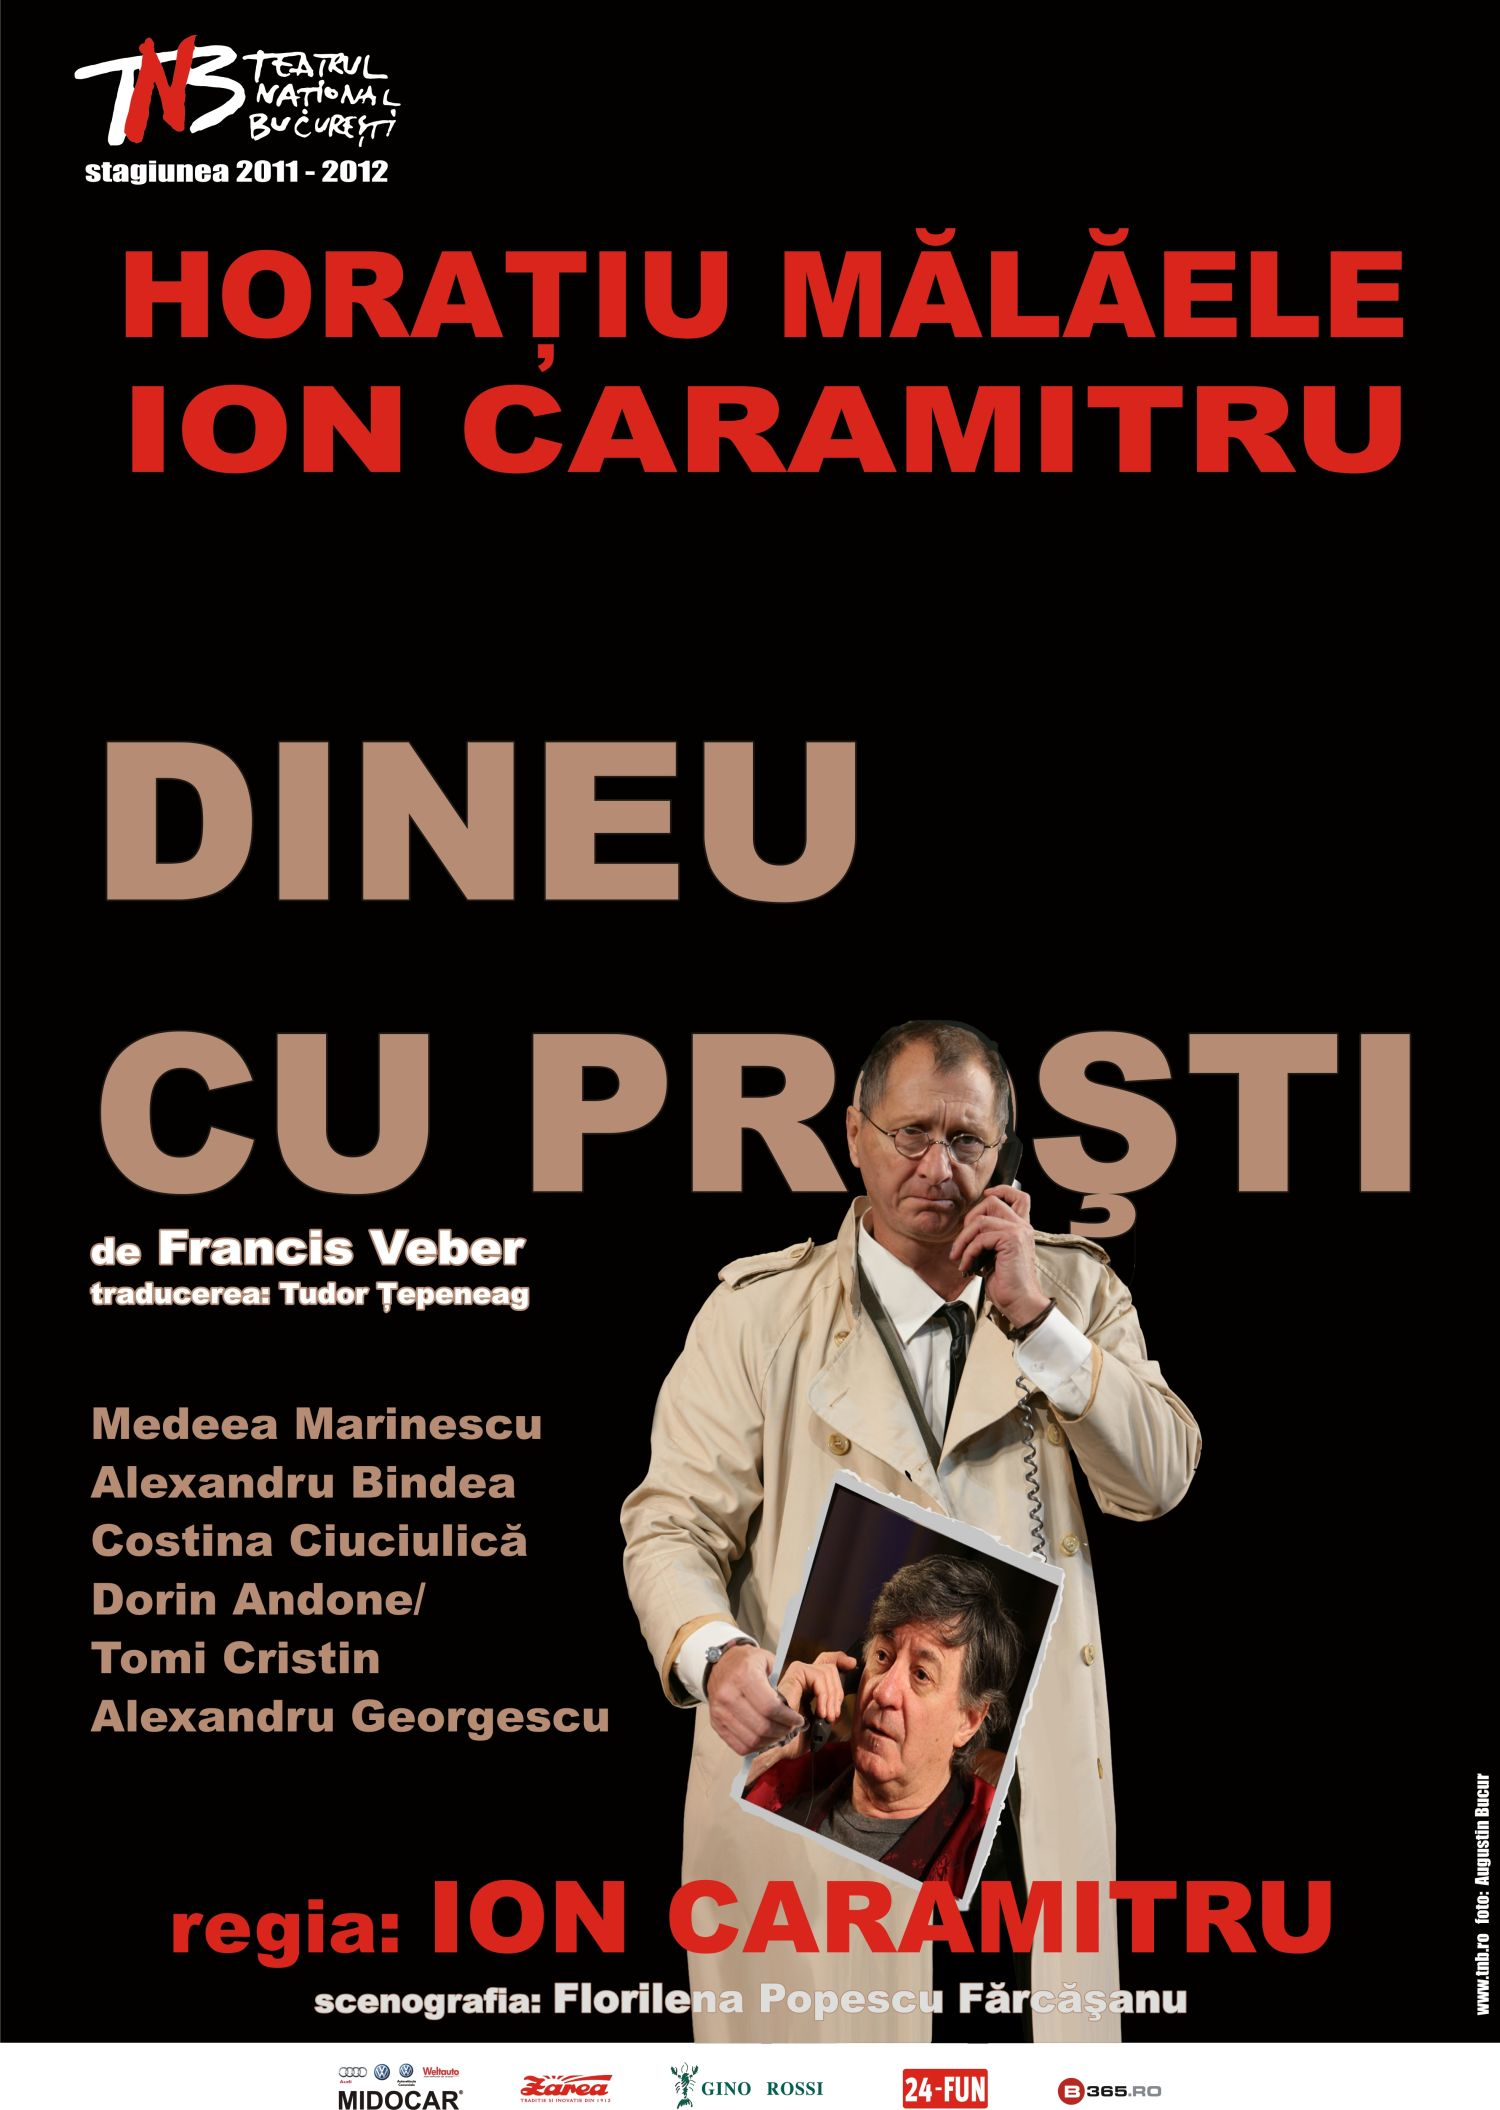 dineucuprosti_cara